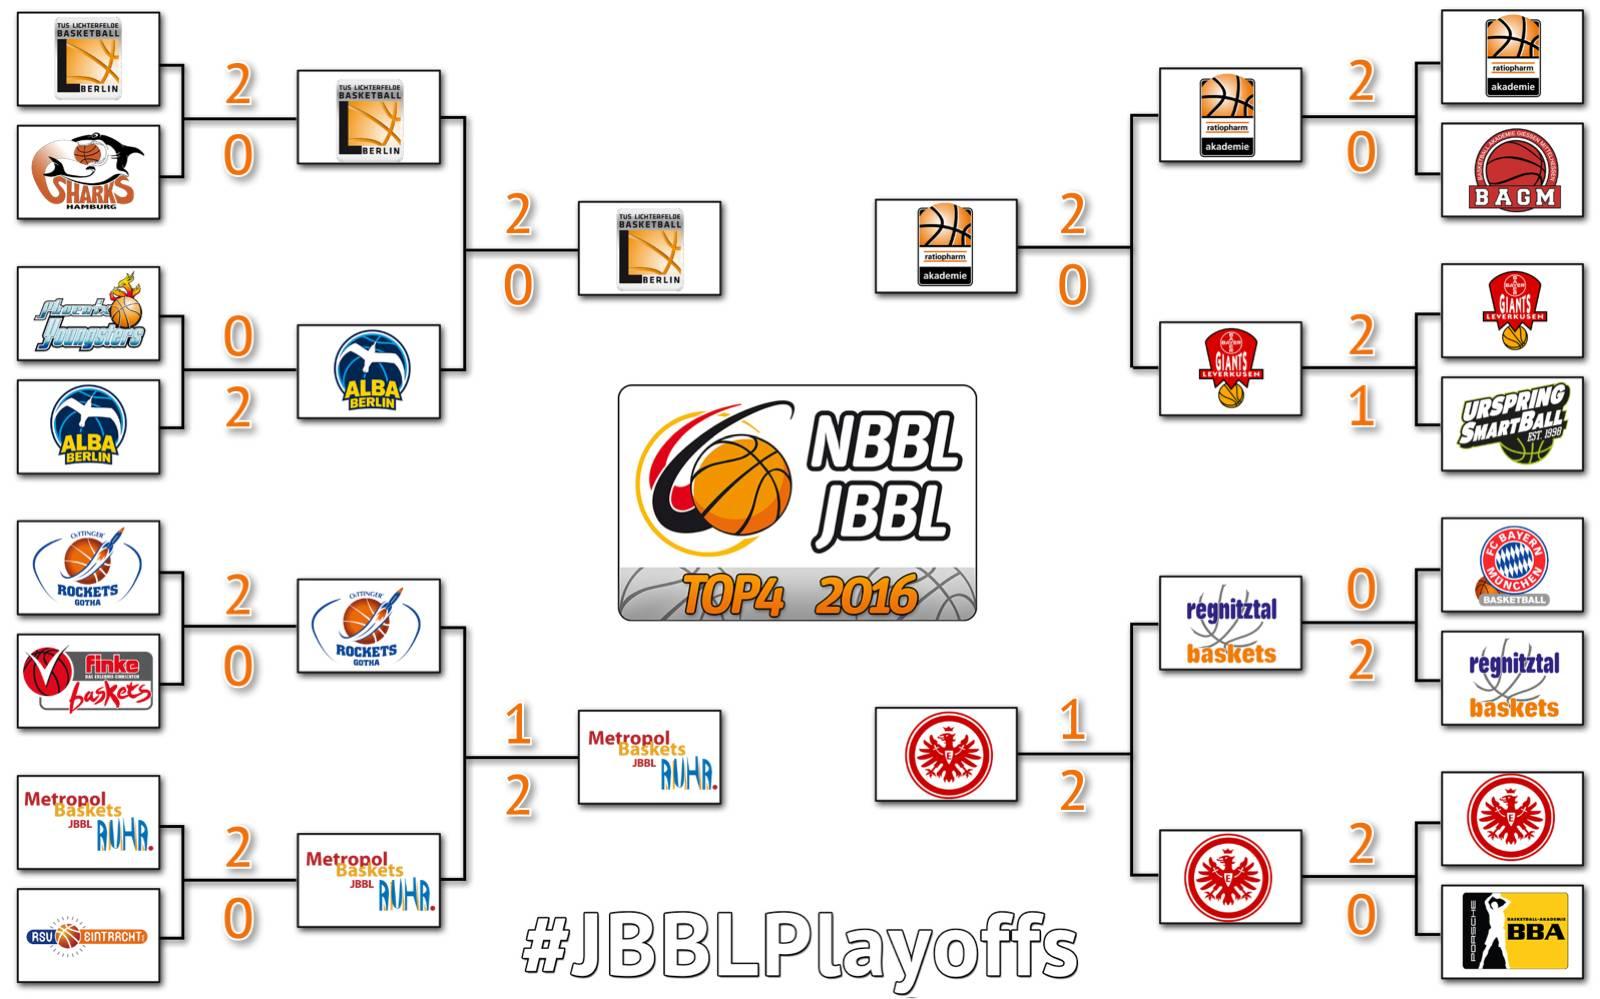 2016-05-08_Playoffs_inkl_Spielstand_JBBL